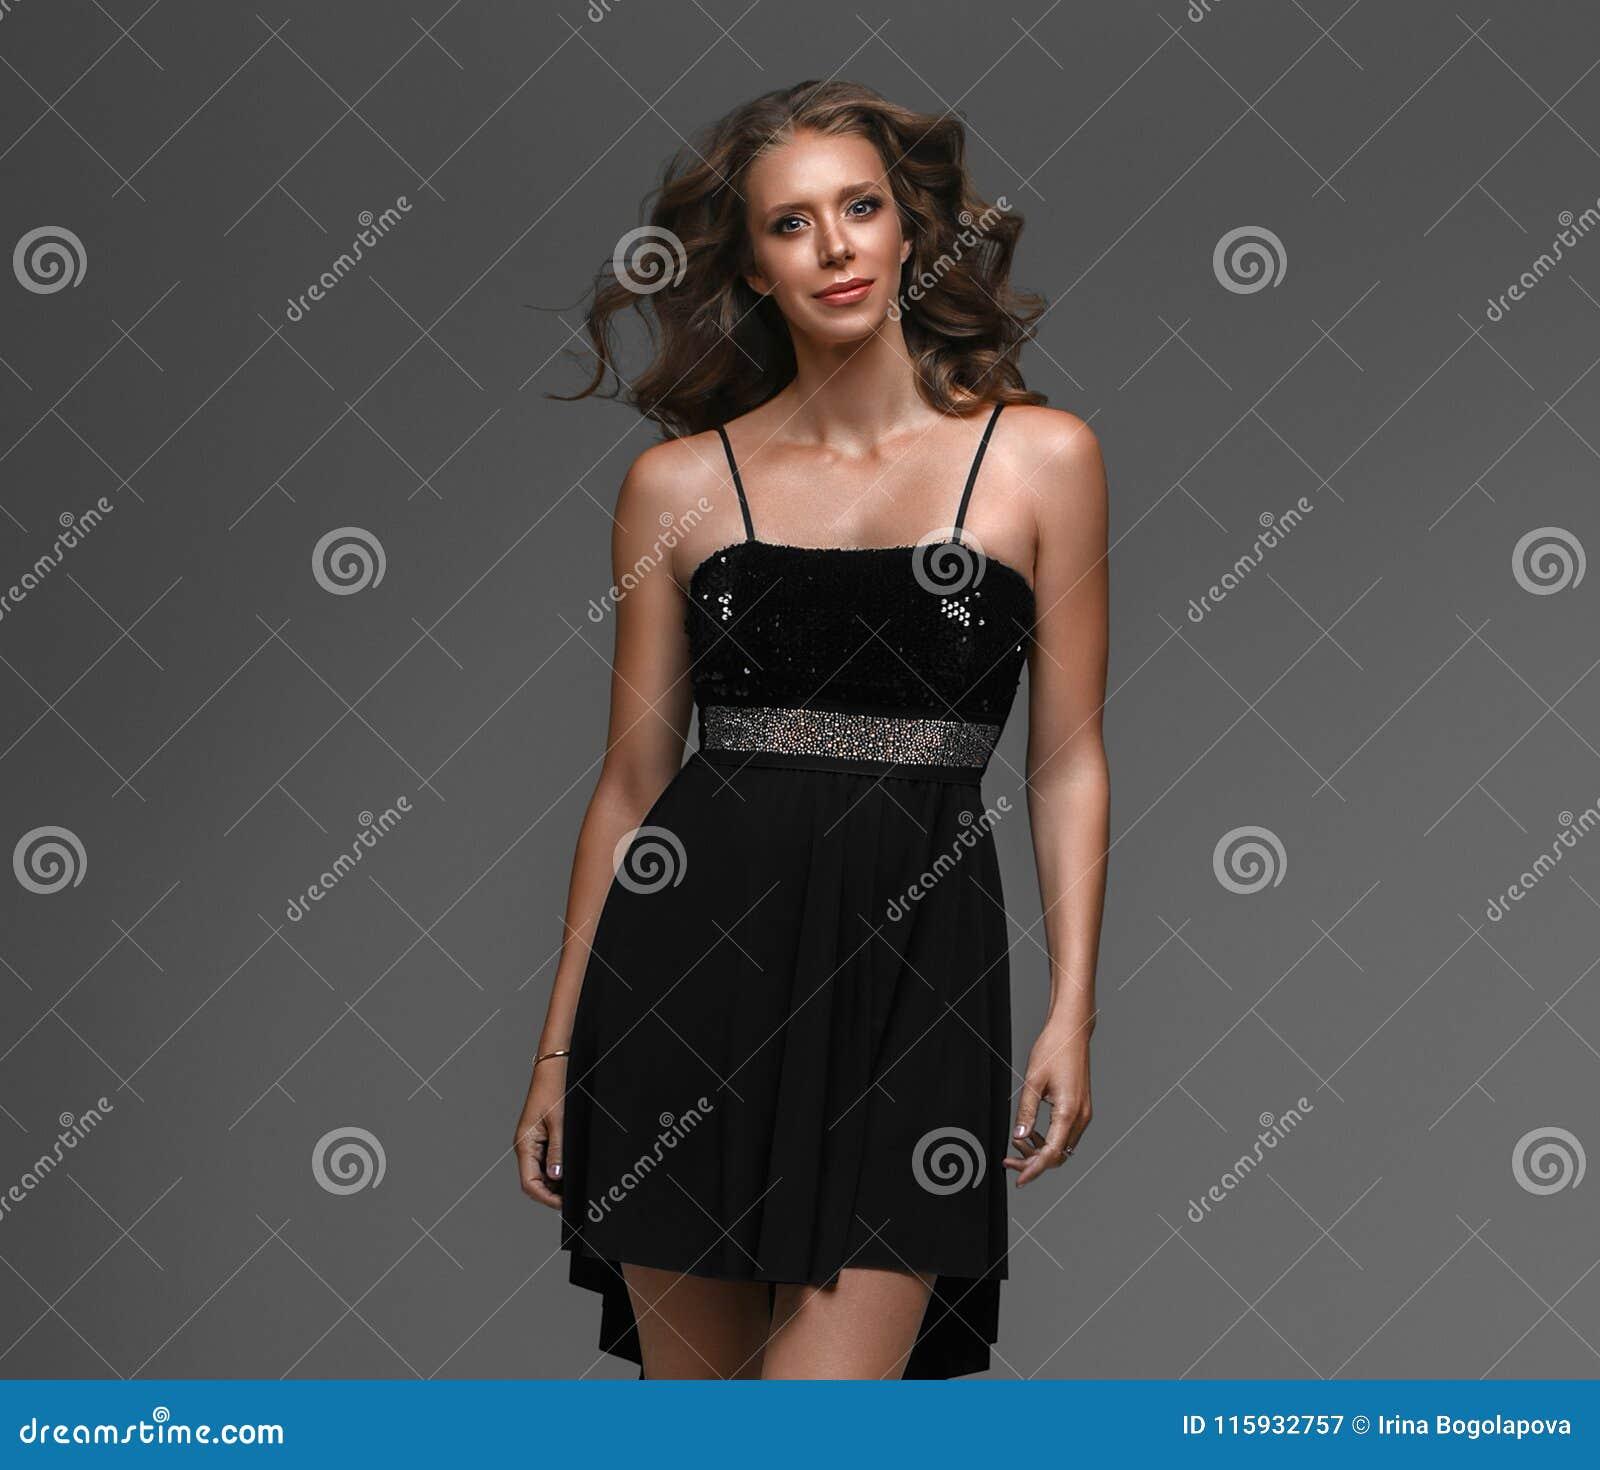 eec0a083f4 Beautiful woman in black dress elegant over gray background. Studio shot.